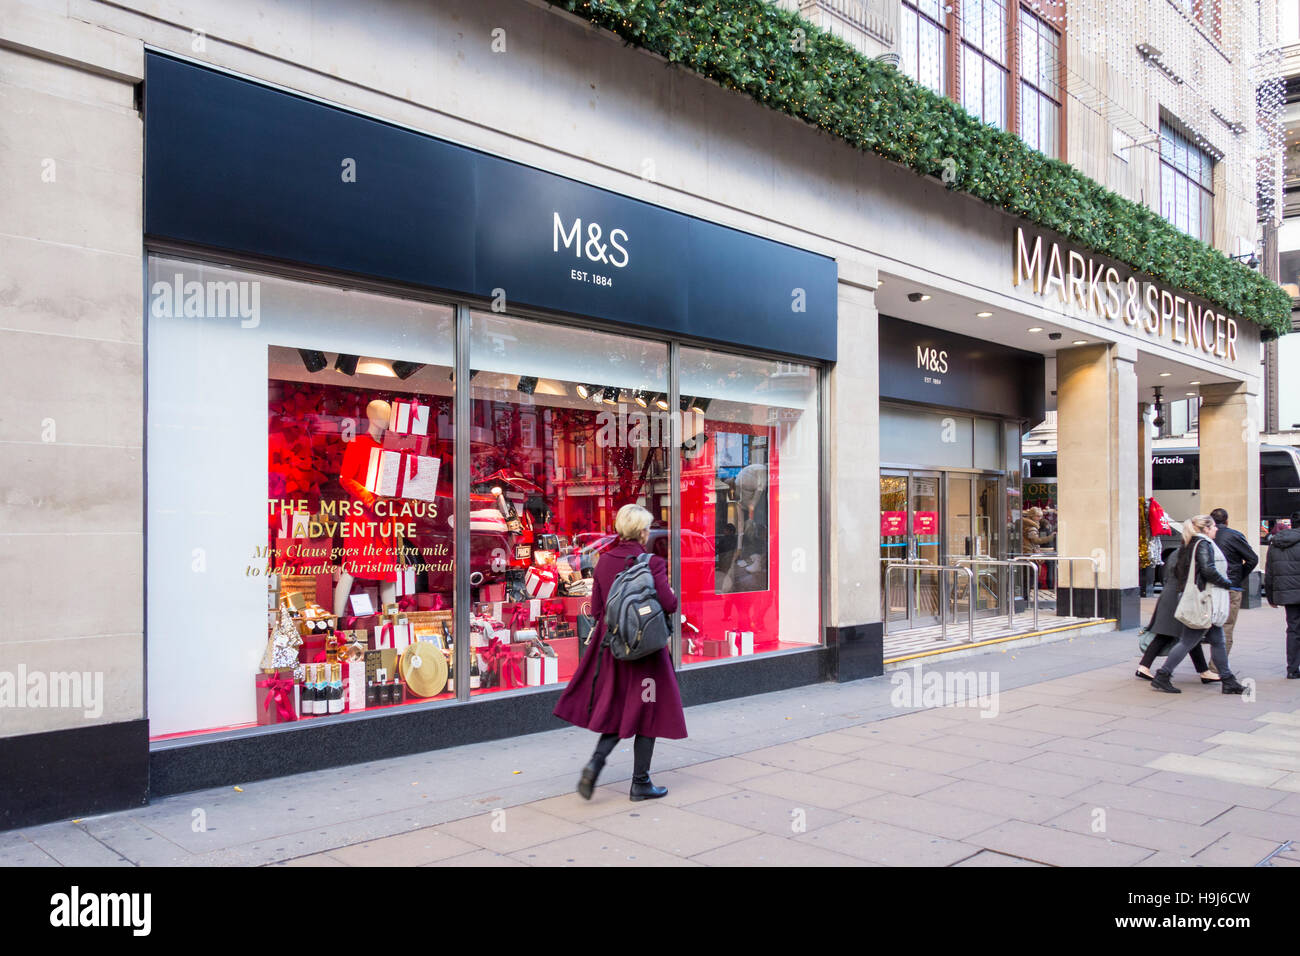 M&S Christmas Windows on Oxford Street, London, UK - Stock Image